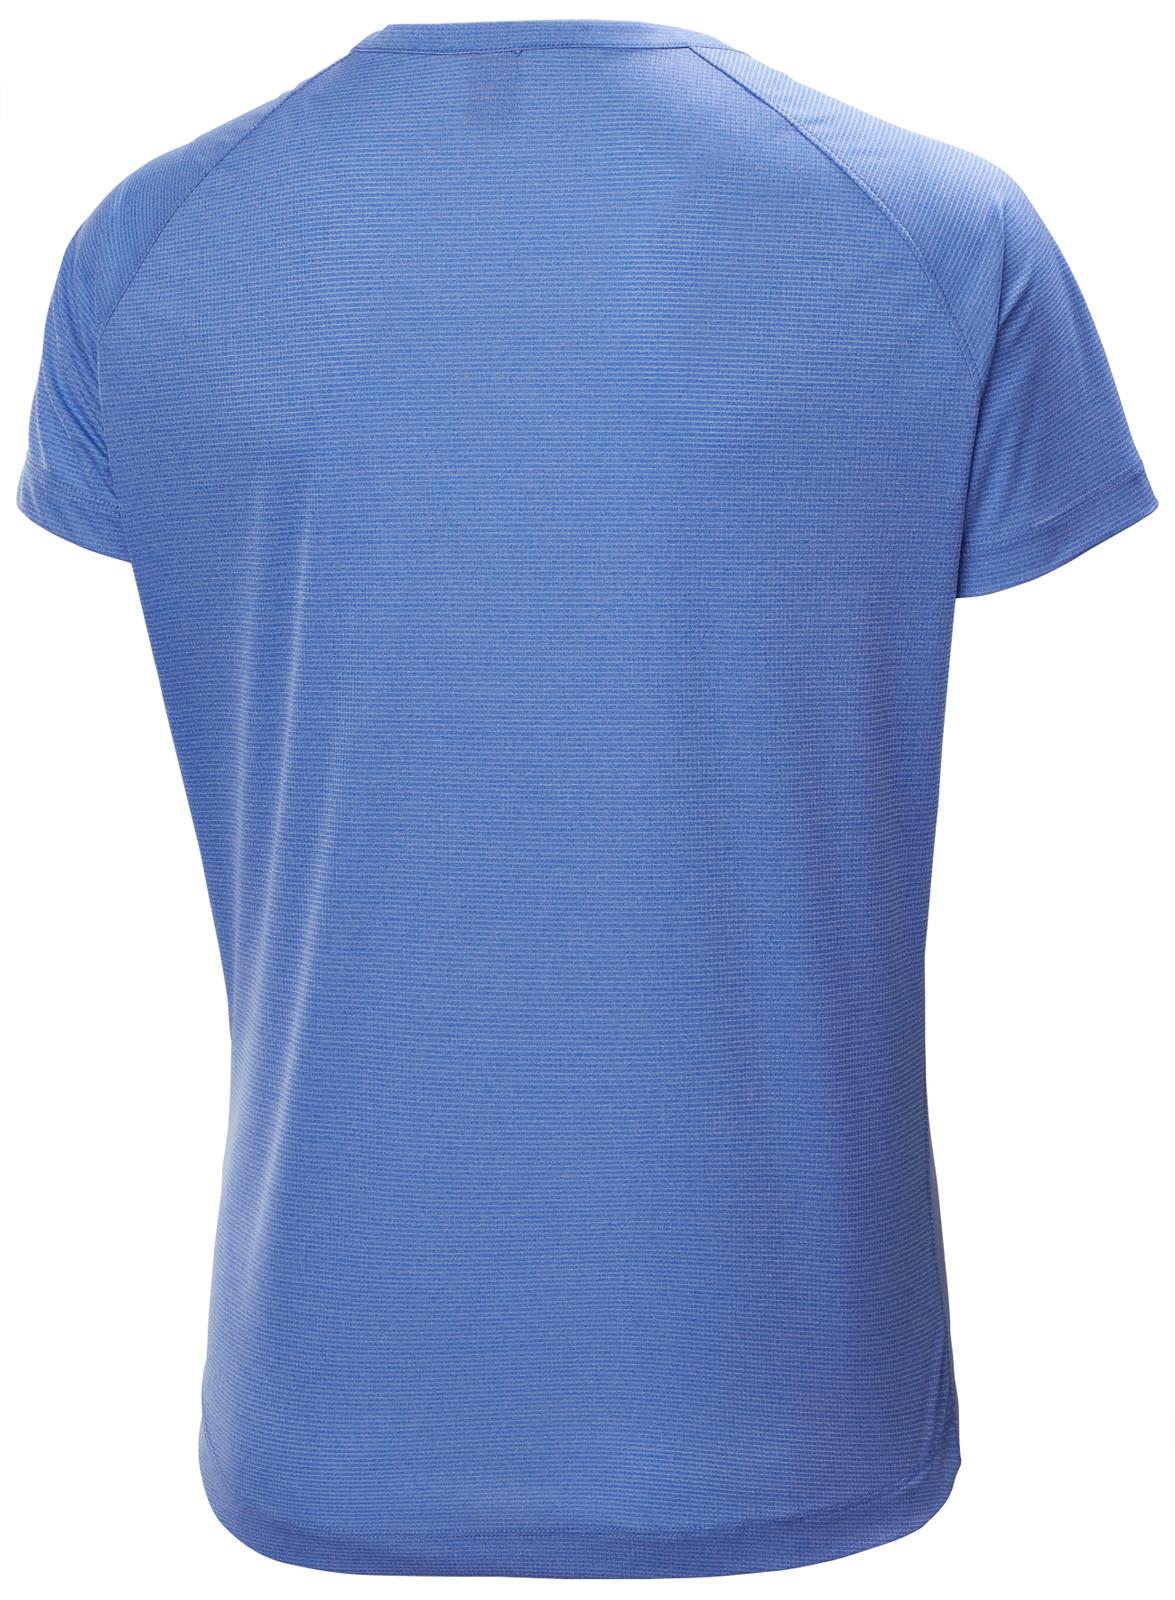 Helly Hansen Verglas Pace T-Shirt, Women's - Royal Blue, 62967-514 back